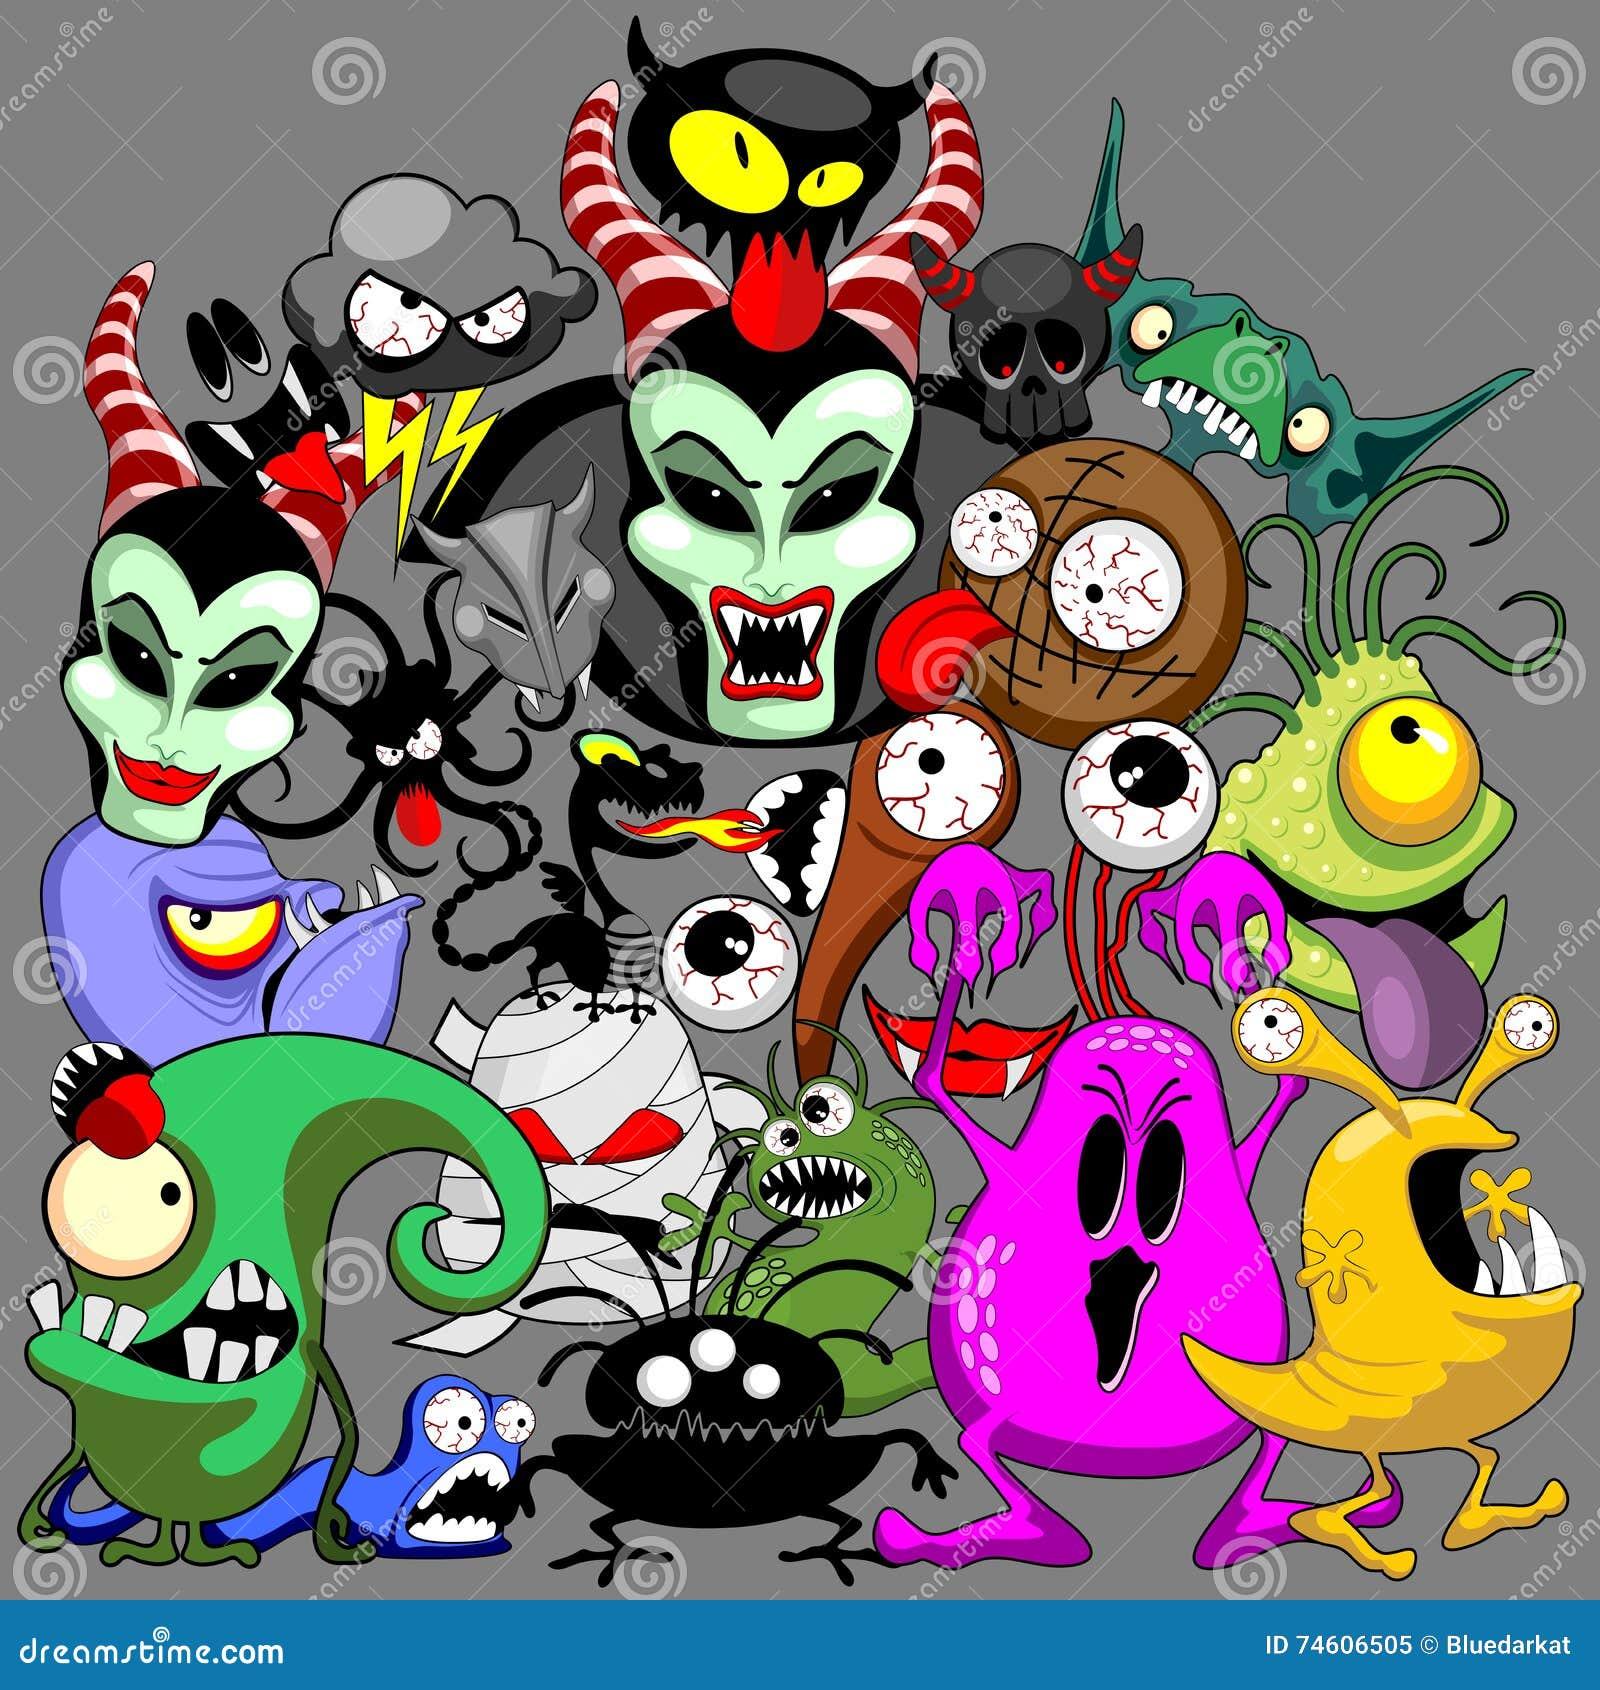 Monsters Doodles Spooky Halloween Characters